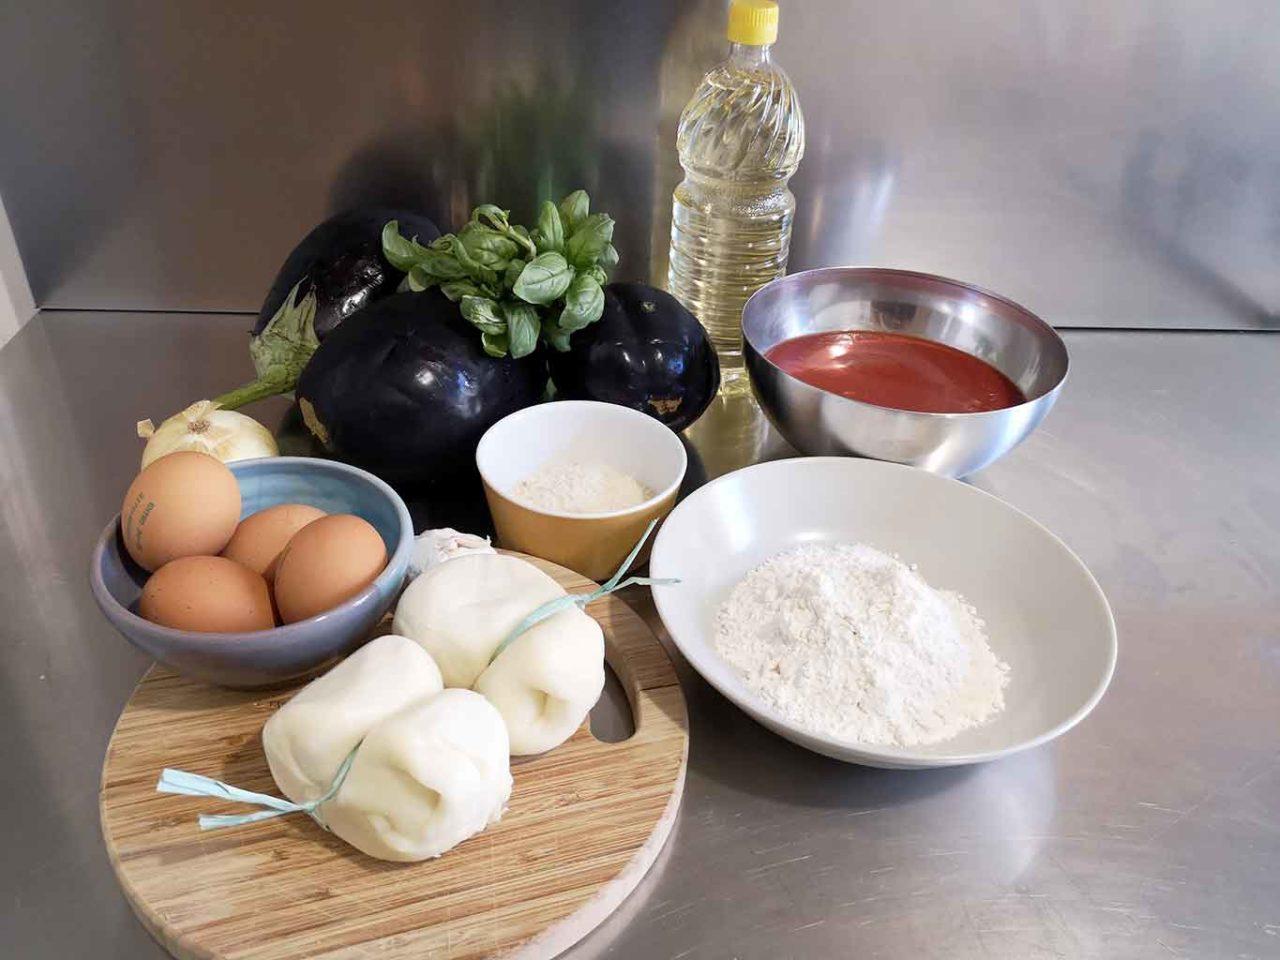 parmigiana di melanzane indorata e fritta ingredienti